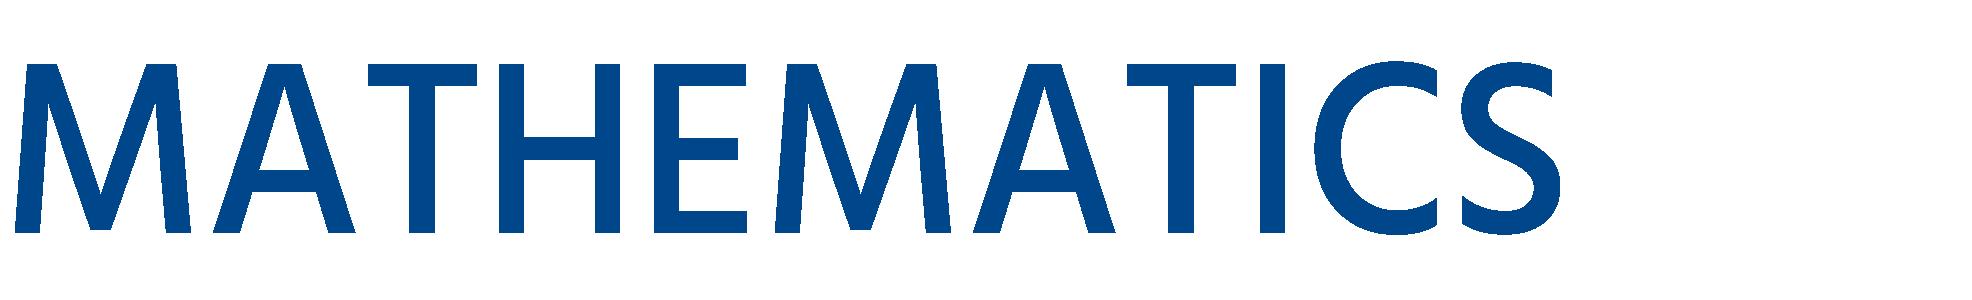 Department of Mathematics - UC Santa Barbara